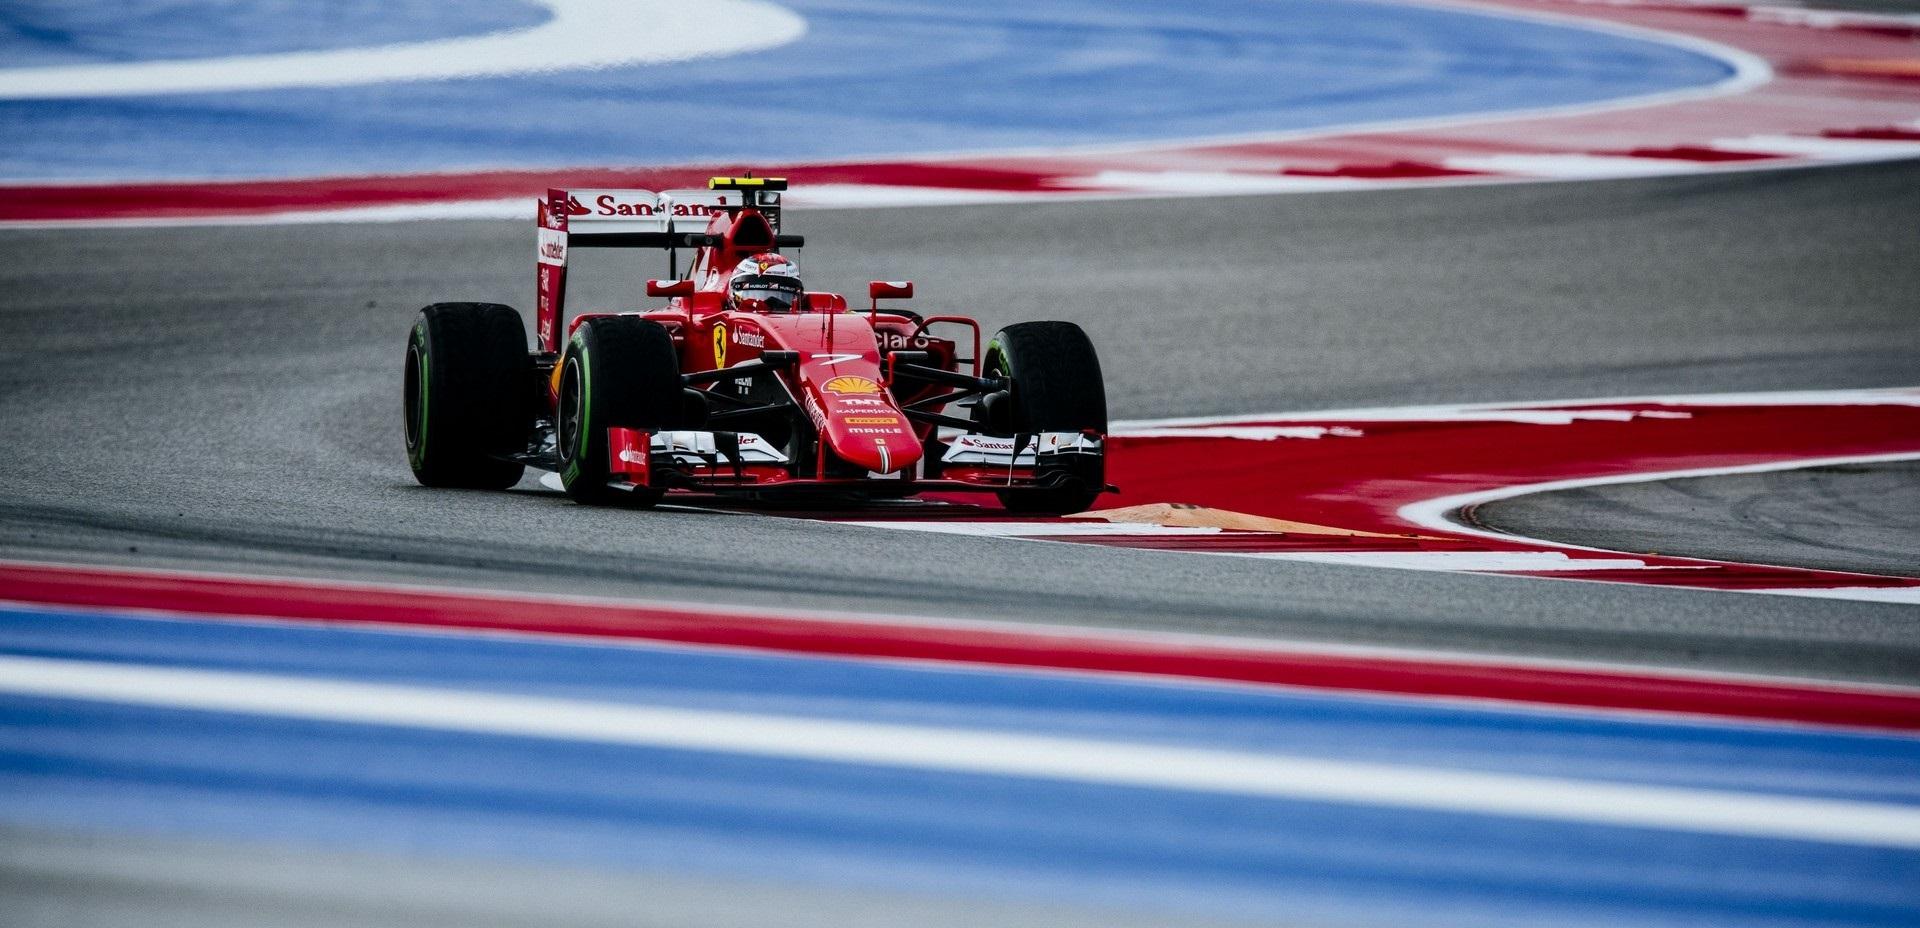 Kimi Räikkönen GP EE.UU 2015